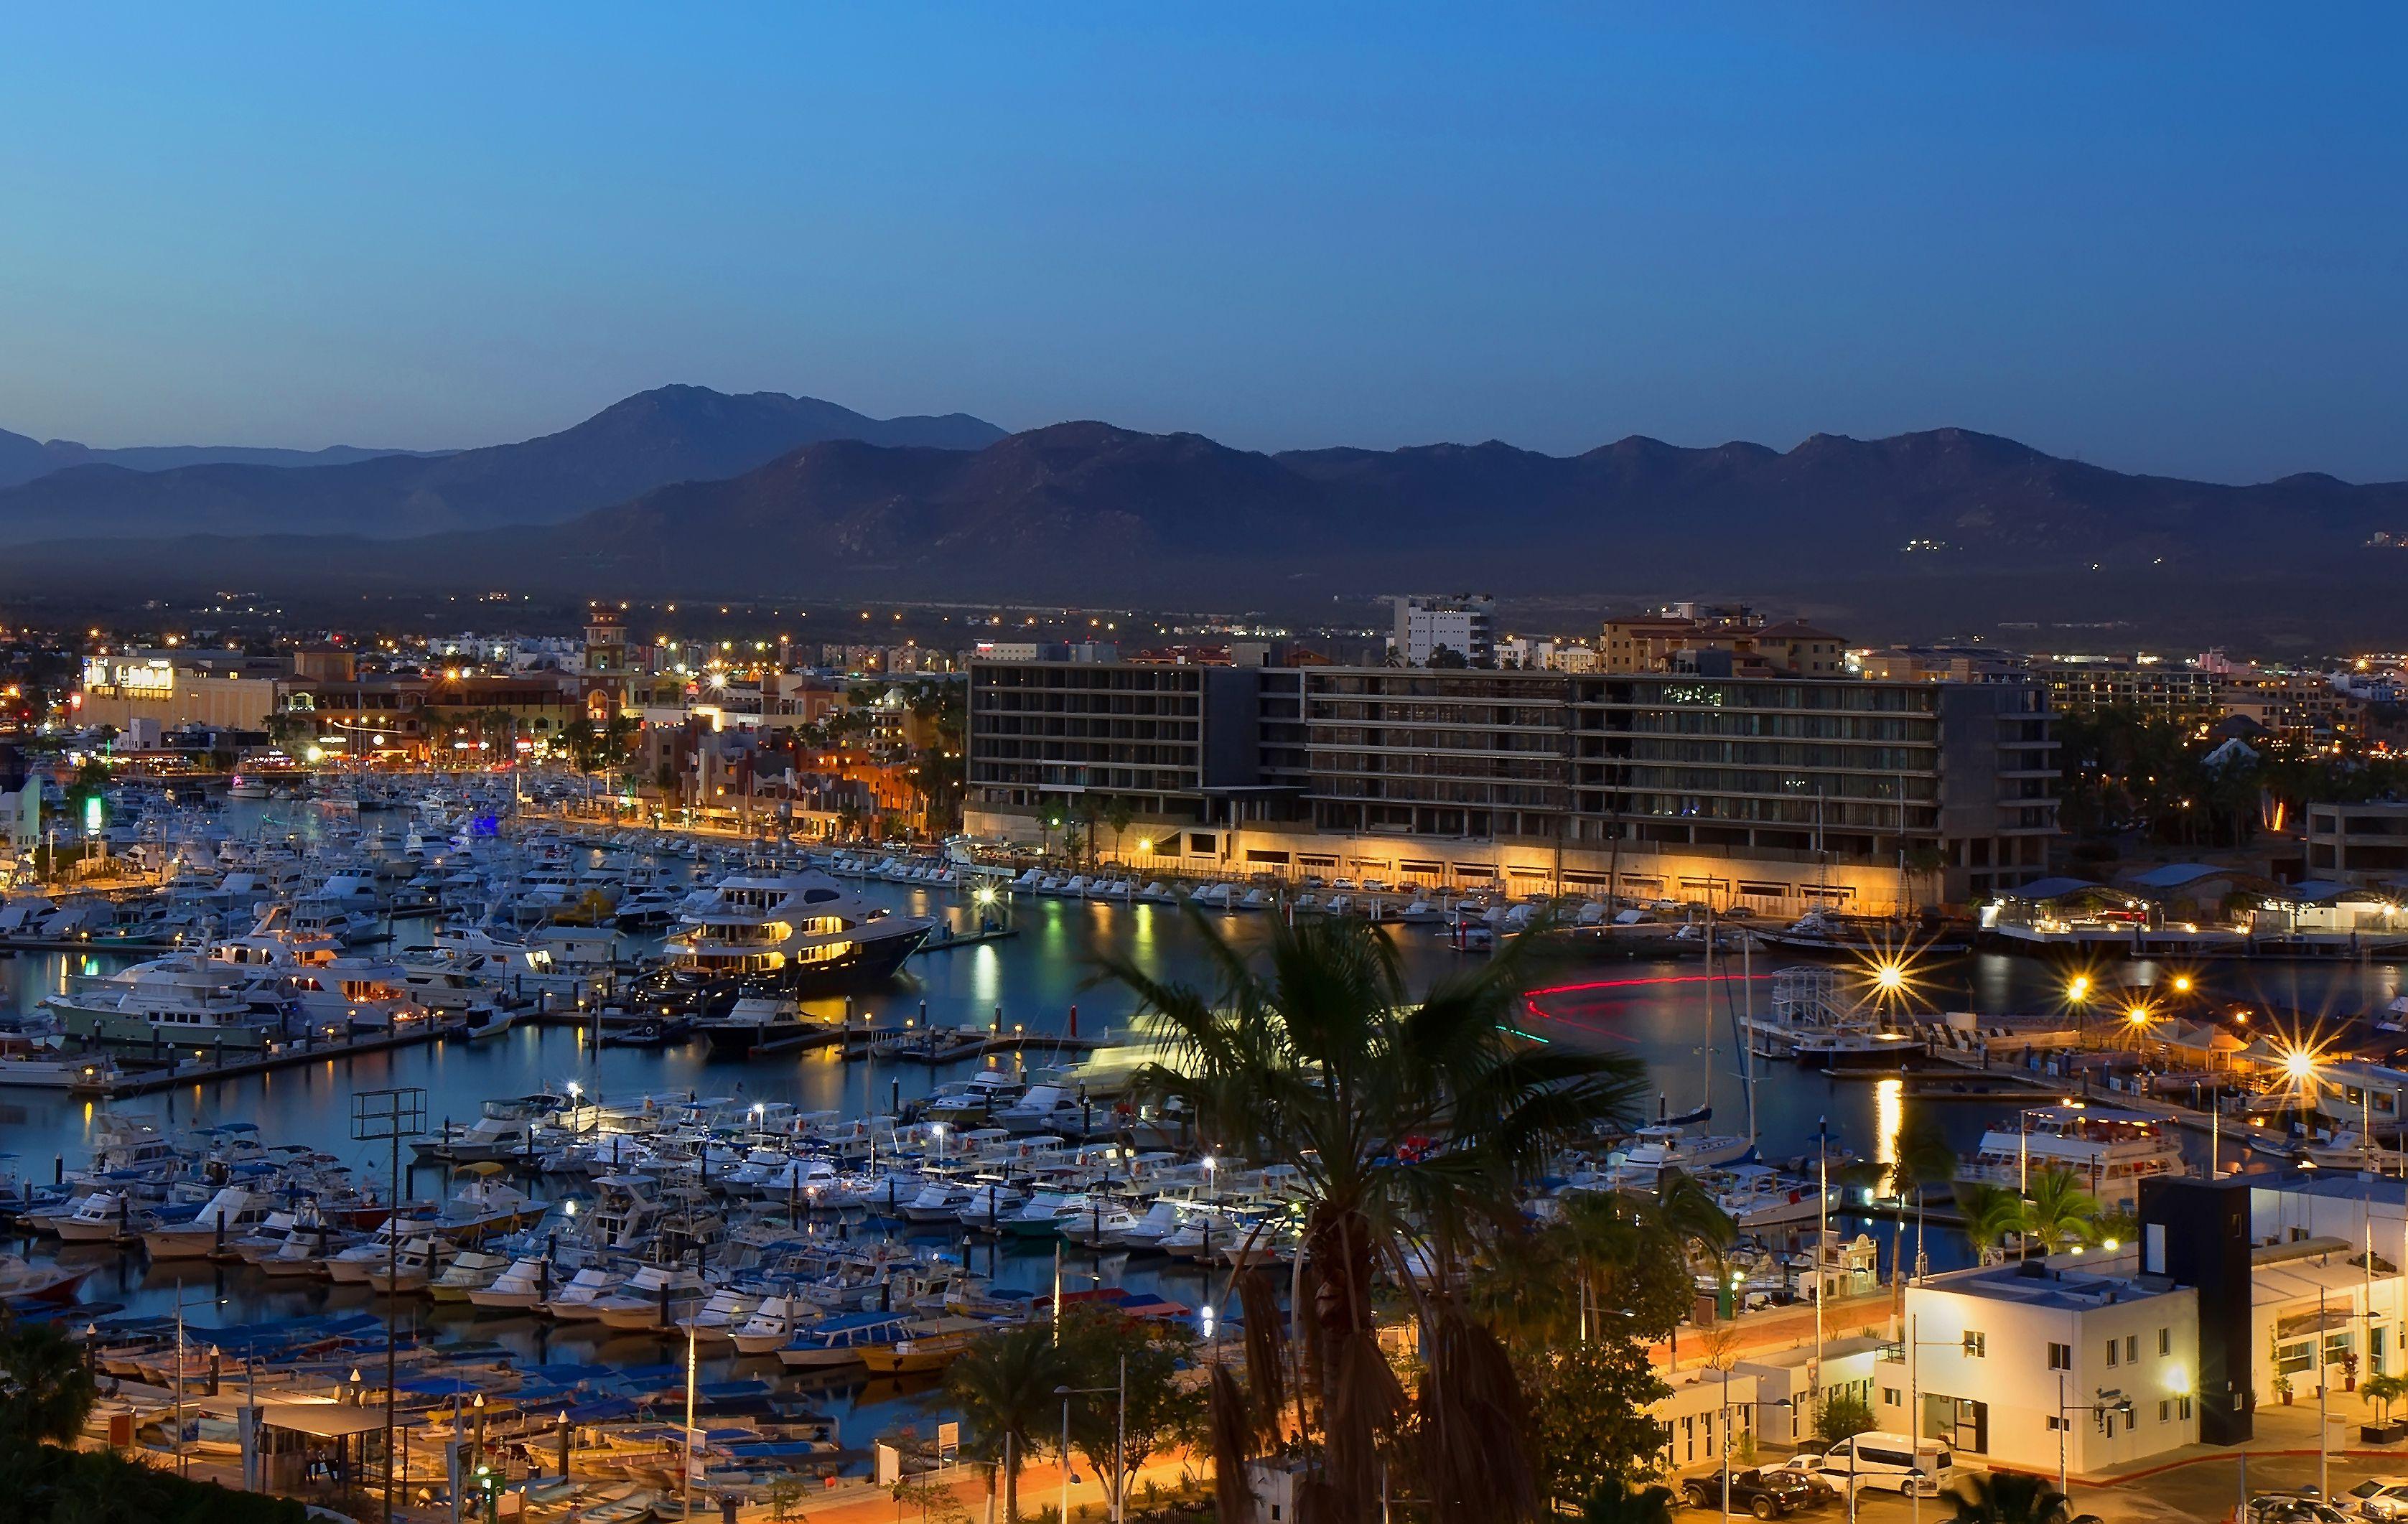 Nightlife in Los Cabos: Best Bars, Clubs, & More